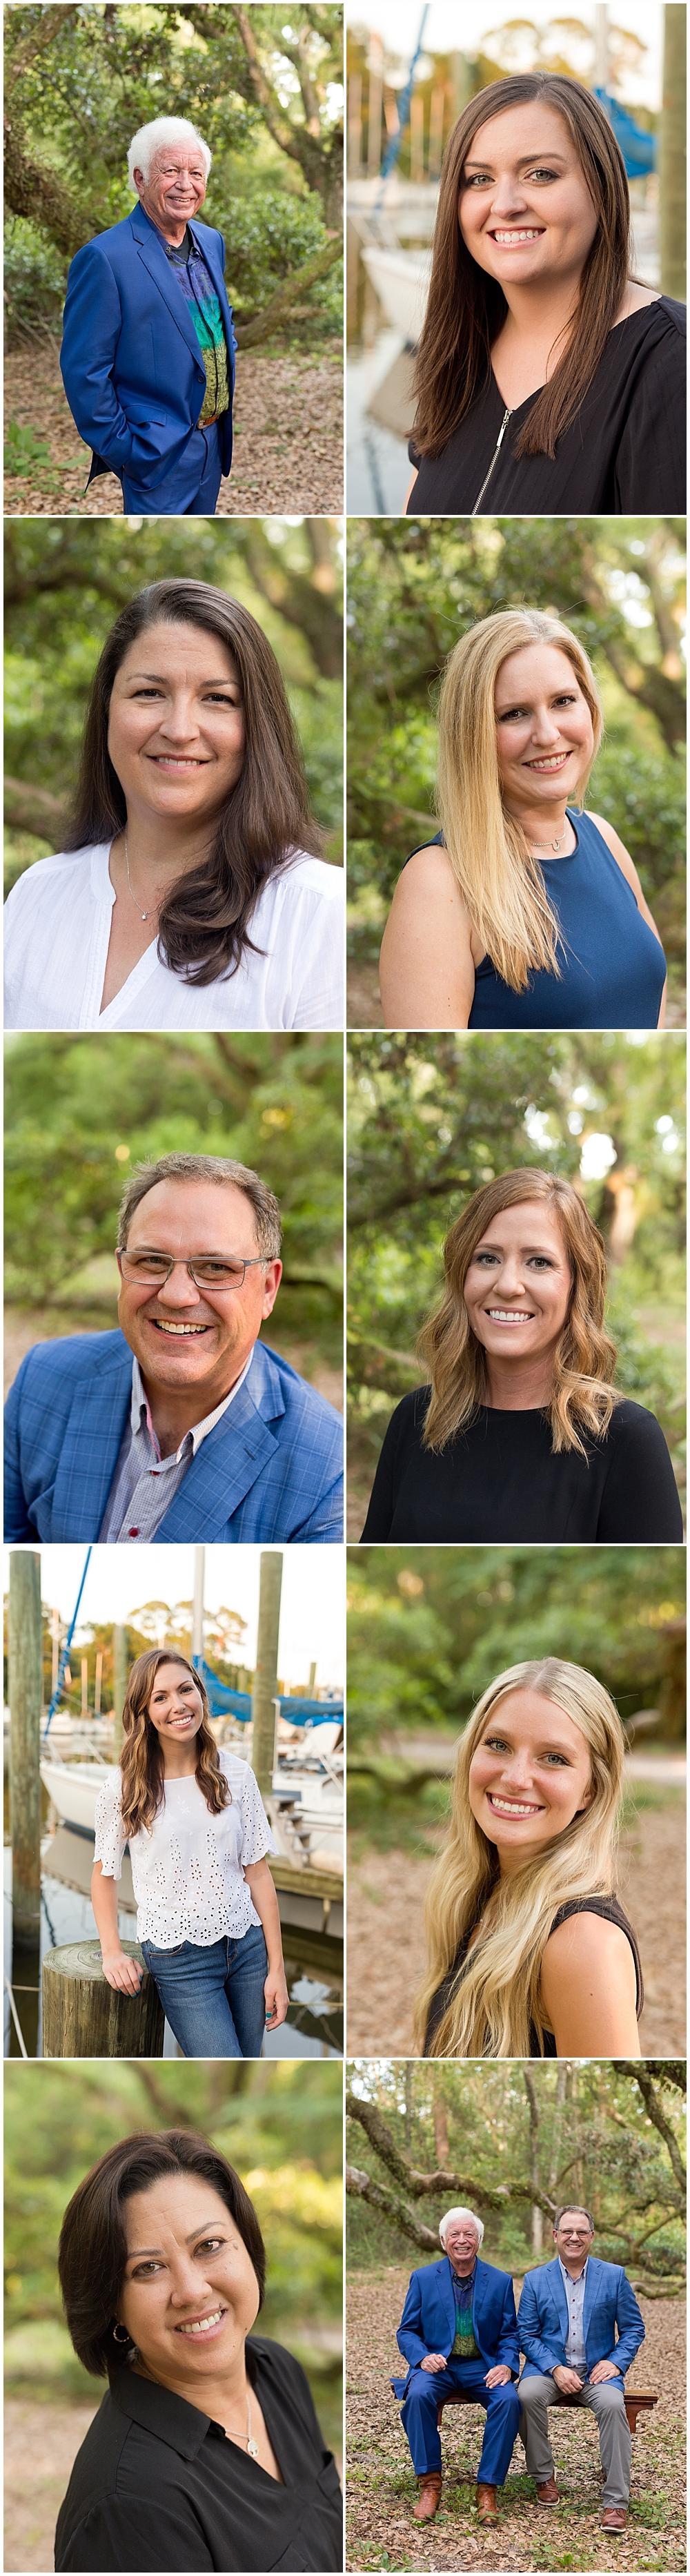 professional headshots in Ocean Springs, MS branding photographer